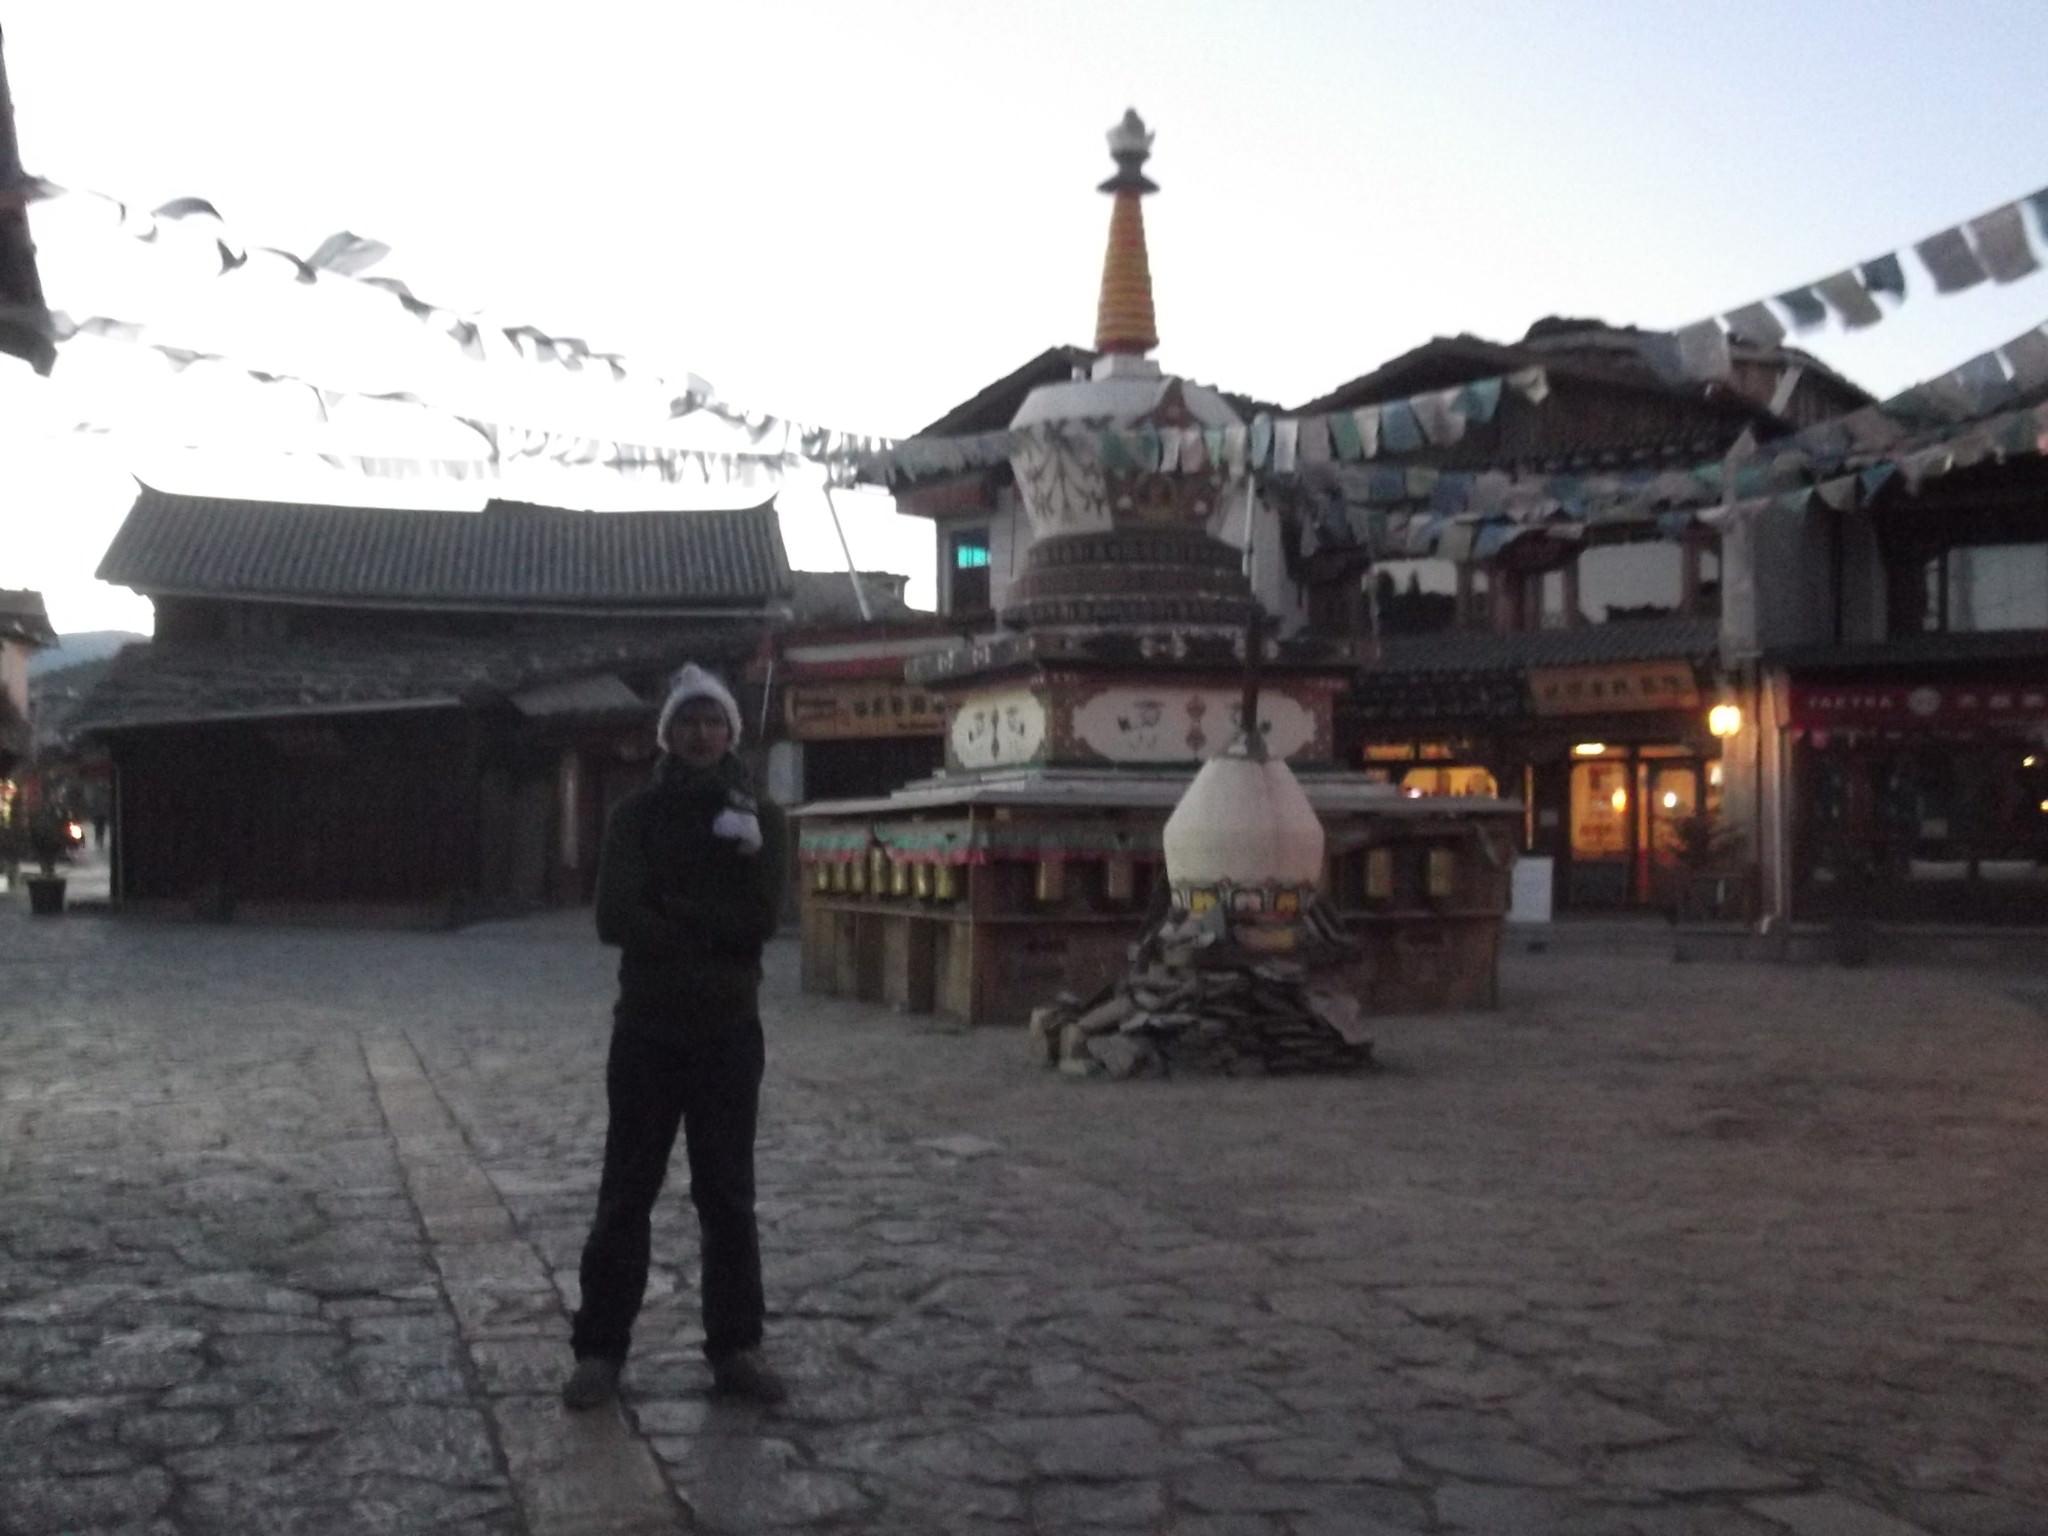 Jonny Blair at a Tibetan Stupa in Shangri La